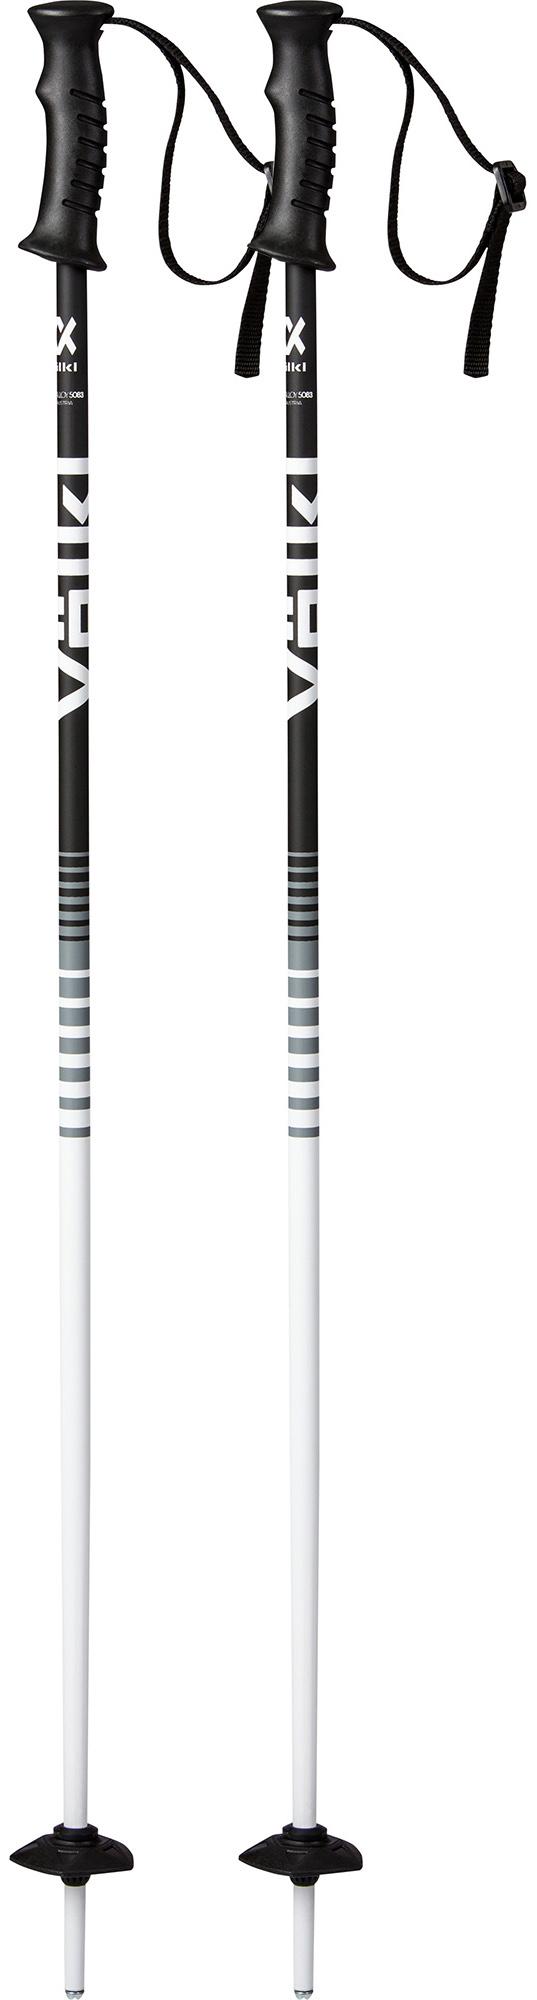 Volkl Палки горнолыжные детские Volkl Speedstick, размер 85